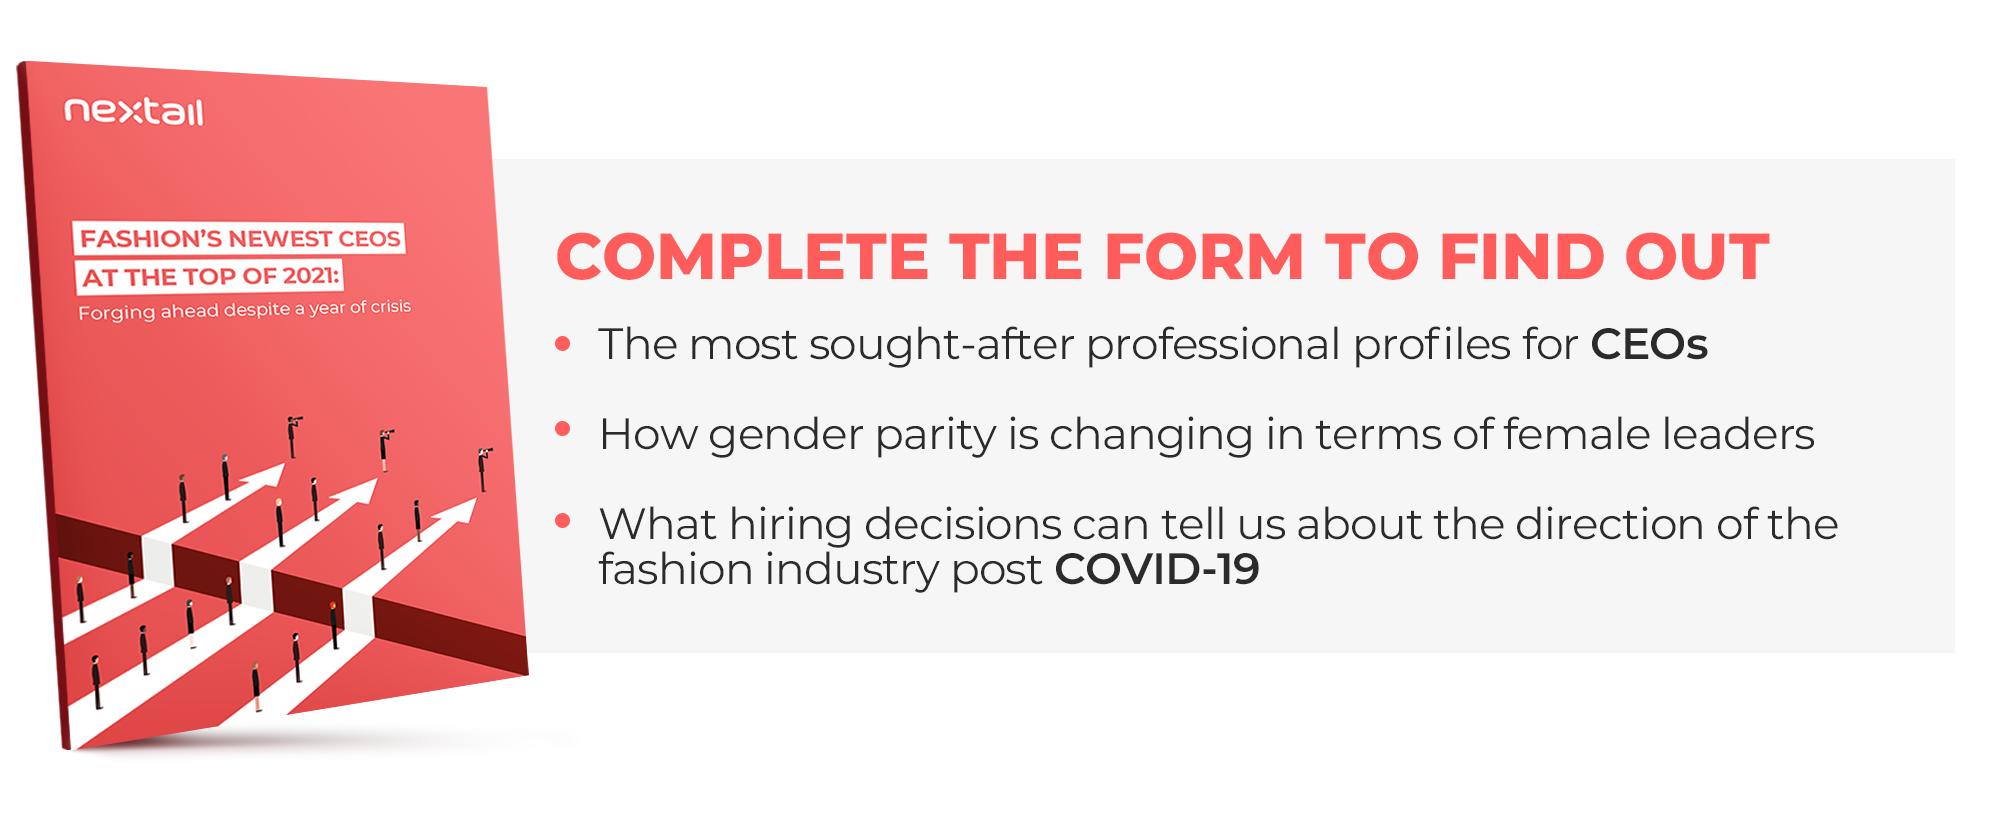 new-fashion-ceos-2021-report-summary